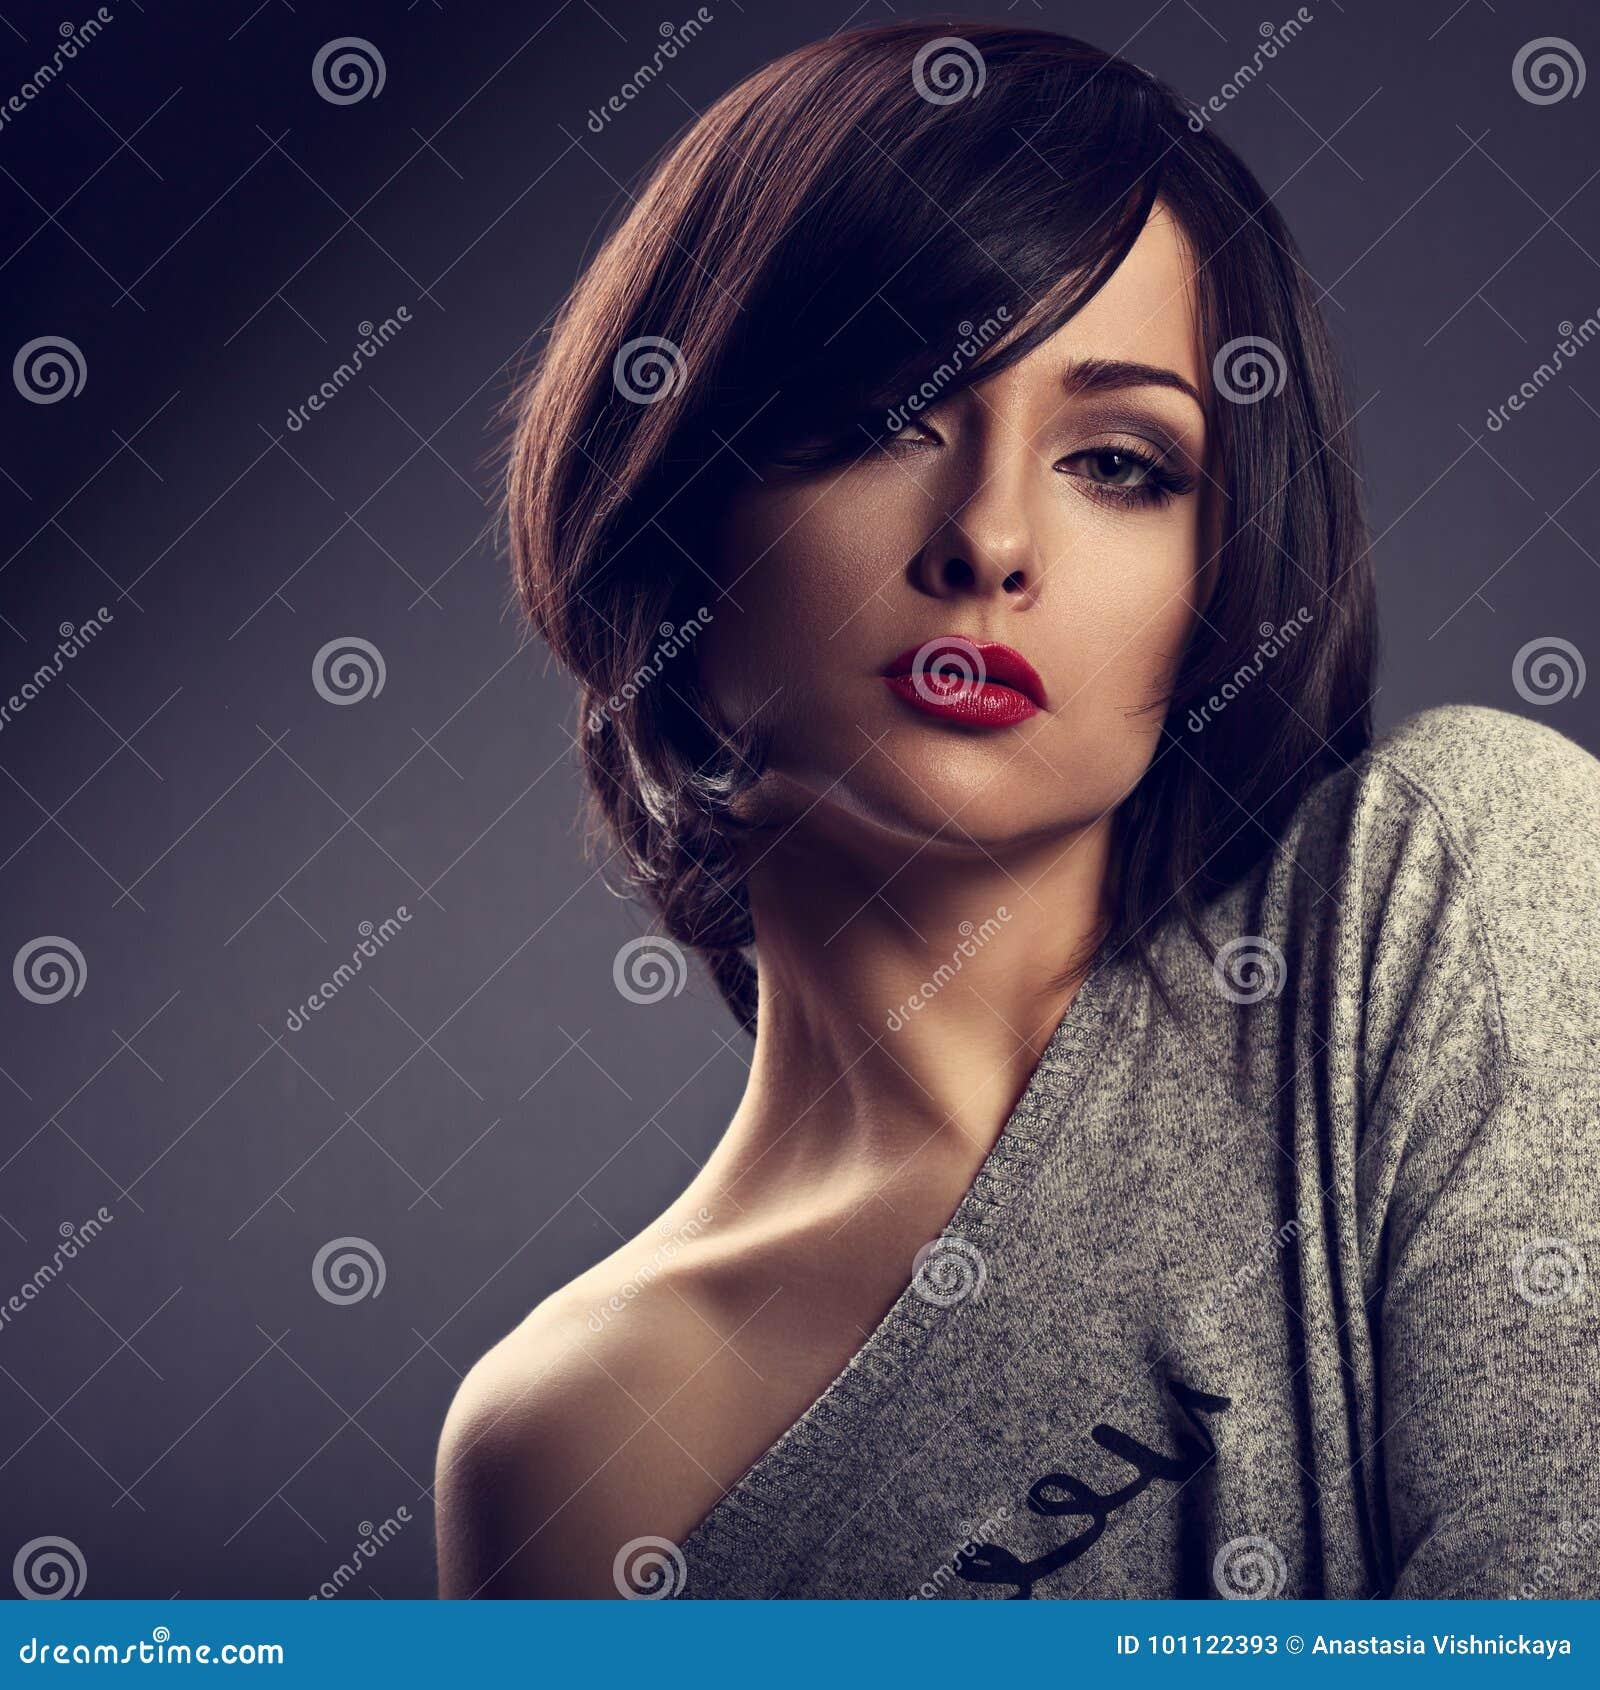 b666170d7af Προκλητική εκφραστική γυναίκα Makeup με το σύντομο ύφος τρίχας ...